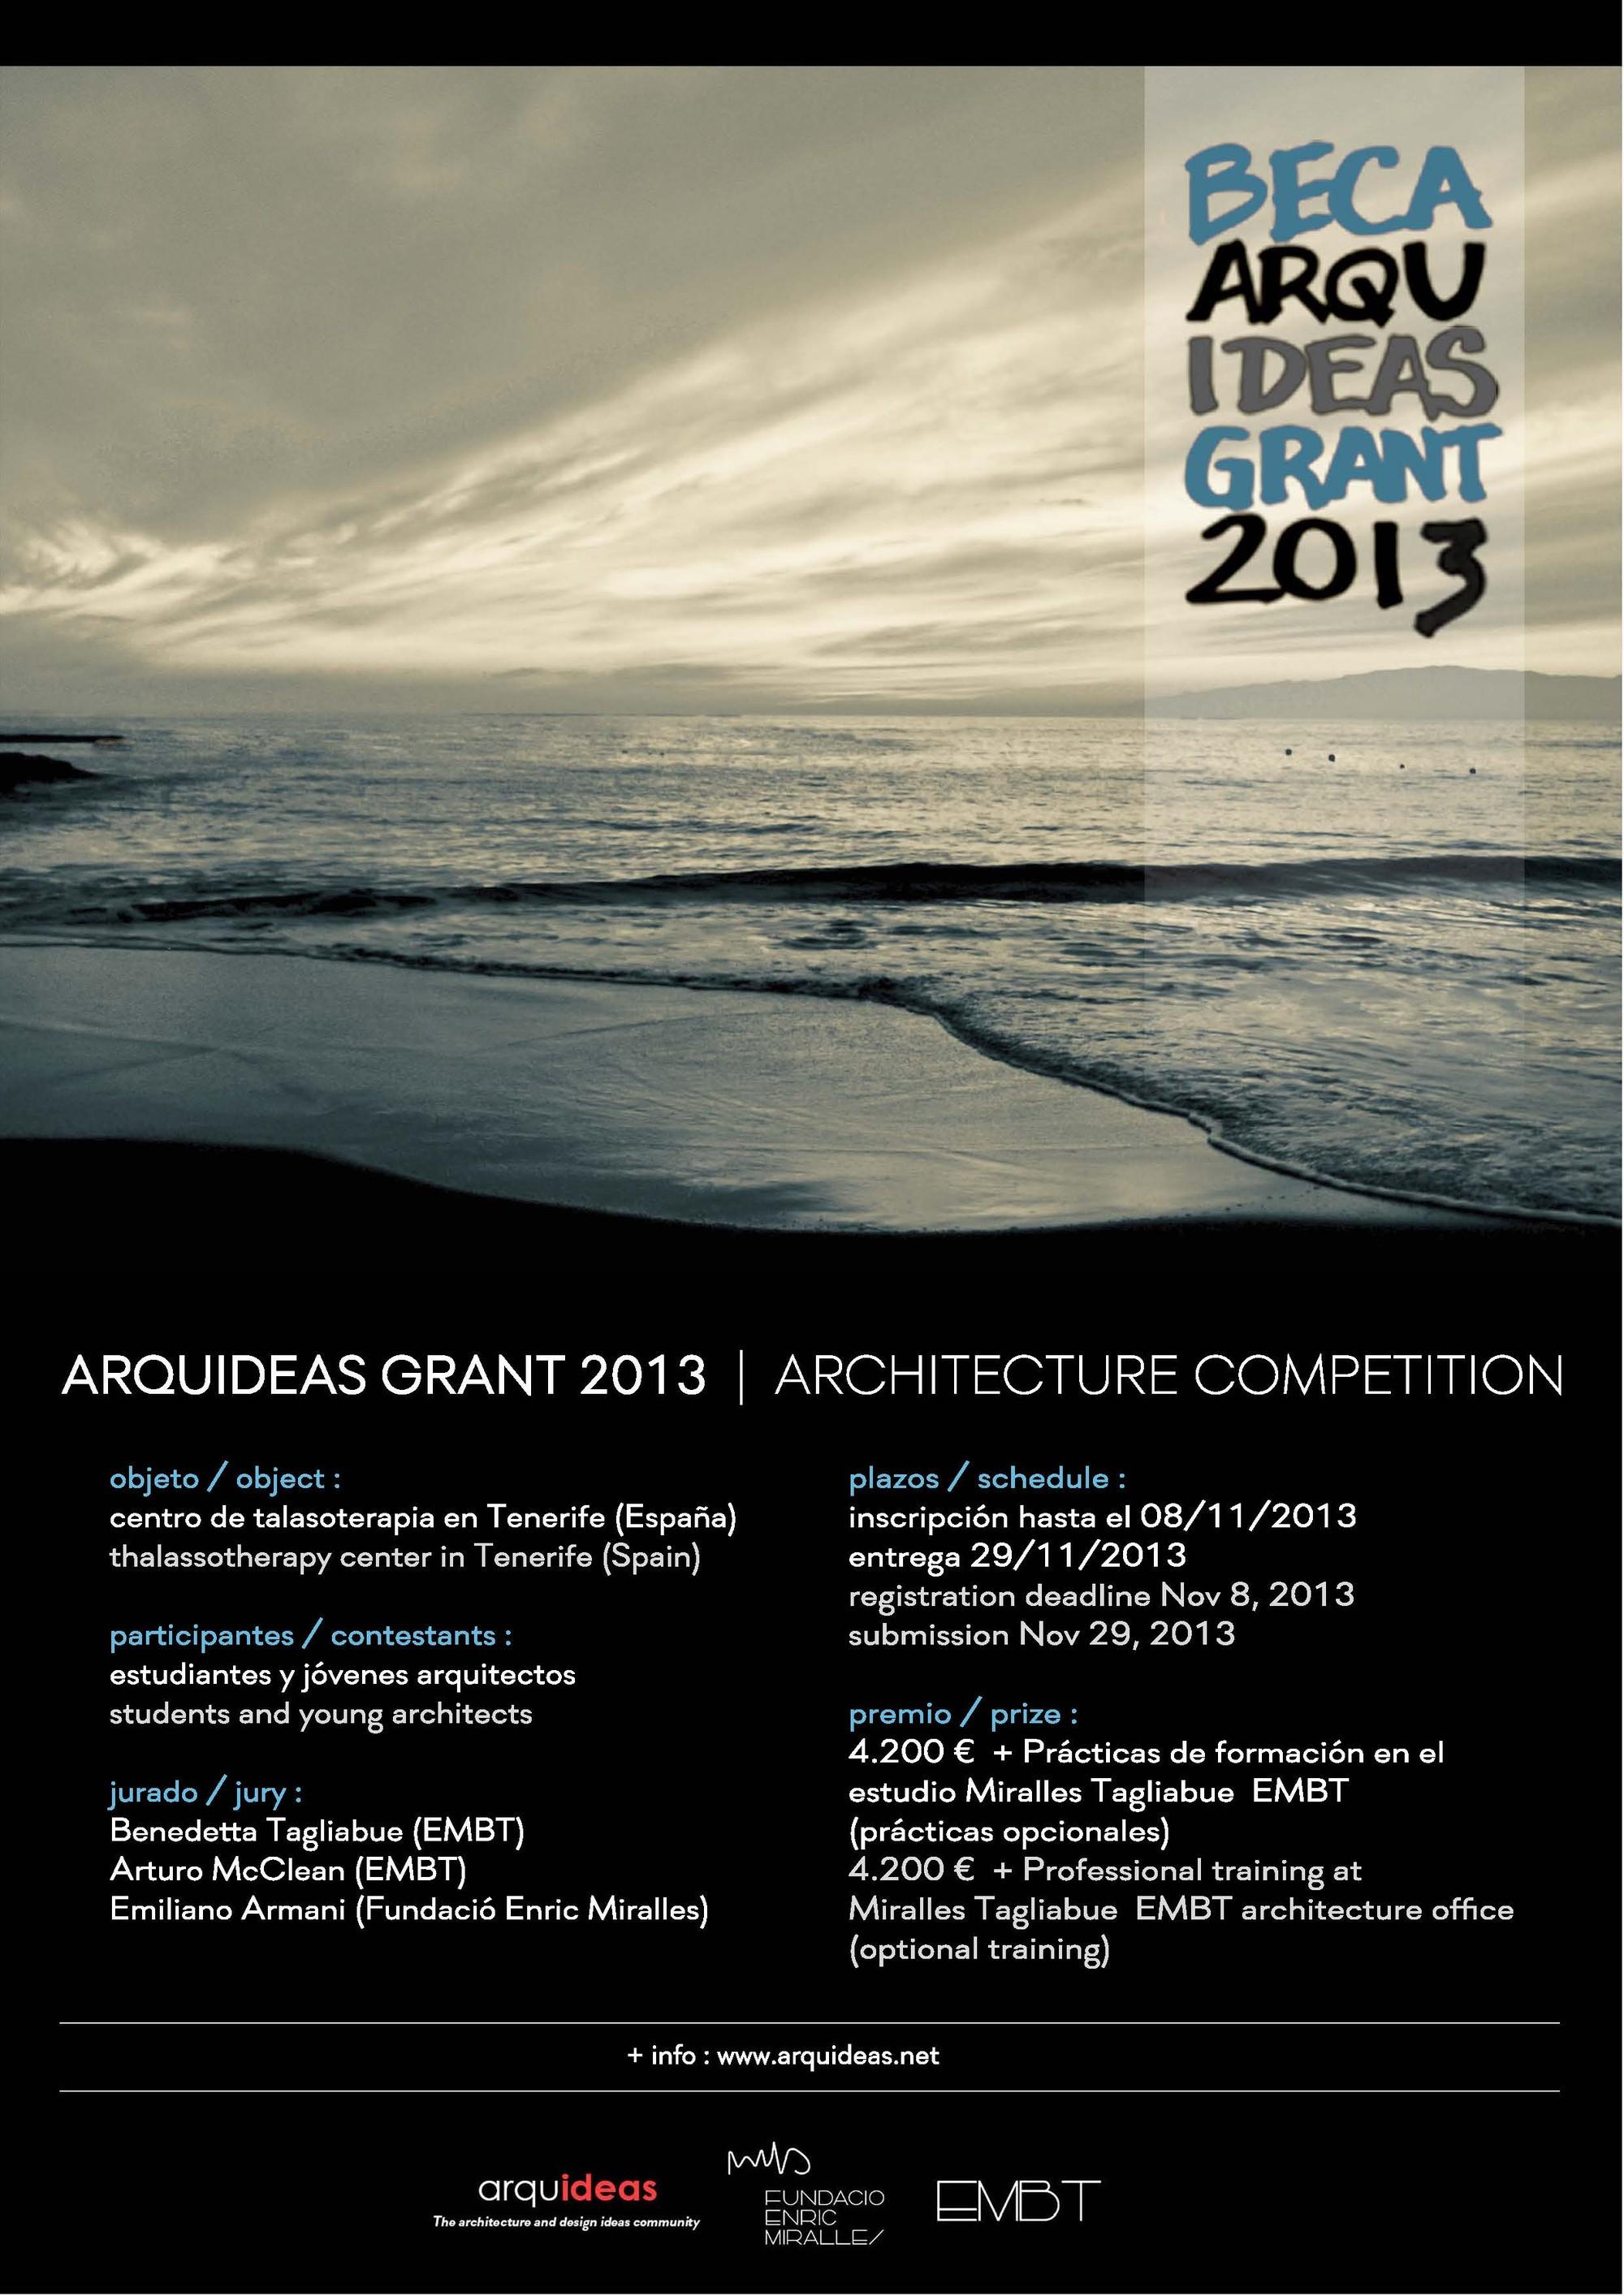 Concurso Beca Arquideas 2013 / Fundació Enric Miralles